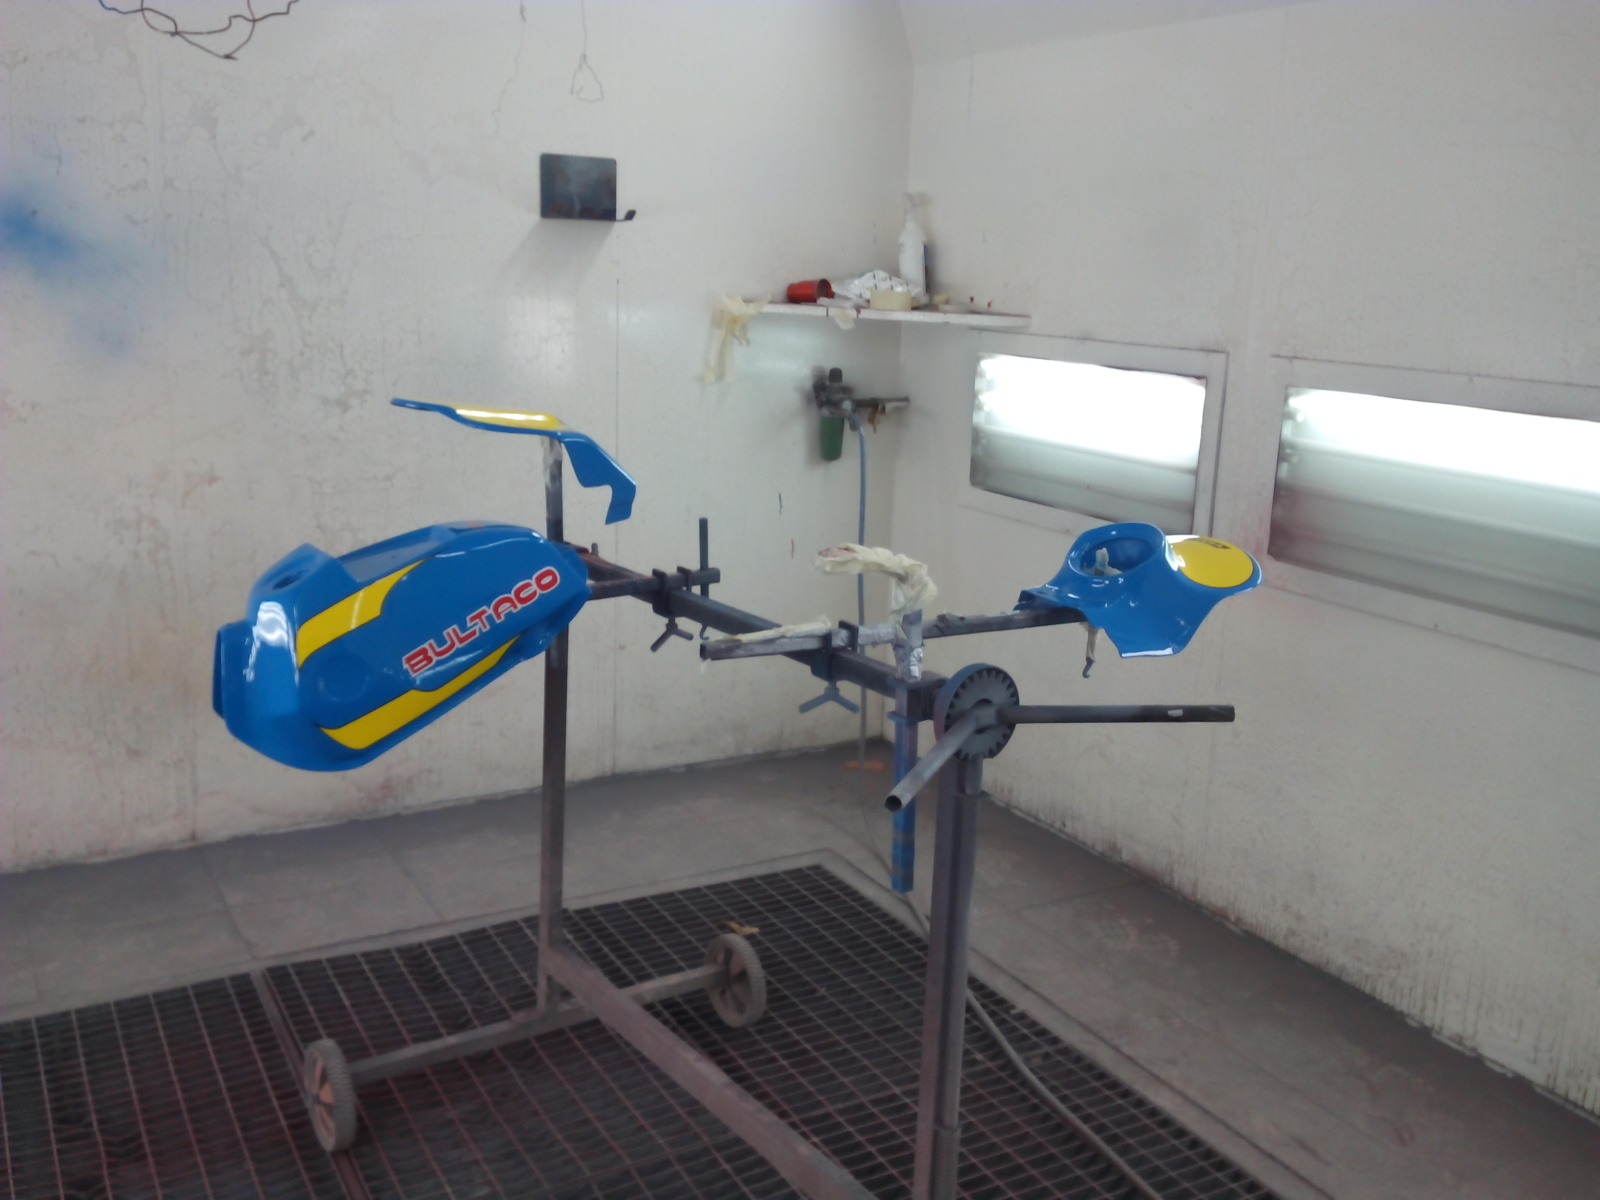 Bultaco MK11 370 - Motor - Página 2 K9gzde